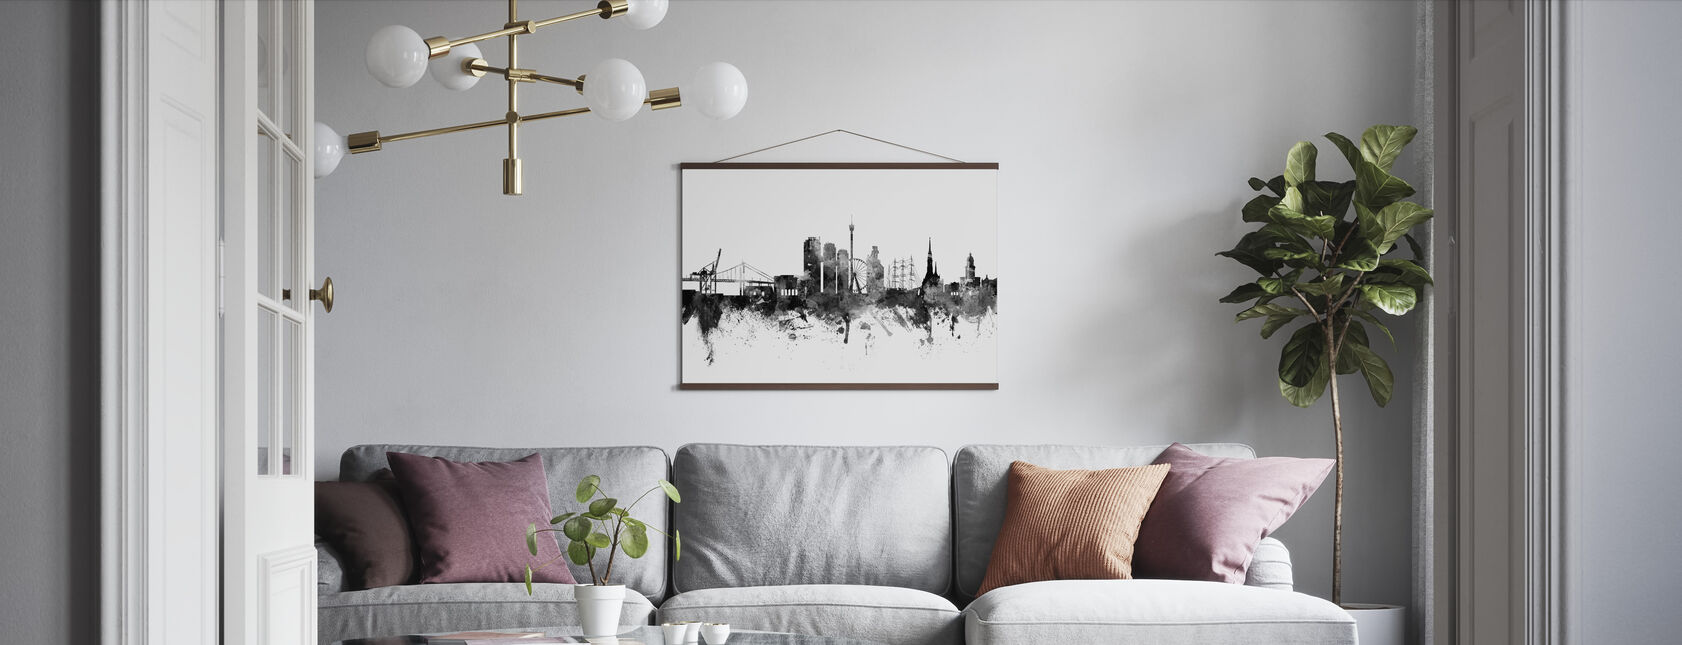 Göteborg Skyline Black - Poster - Vardagsrum